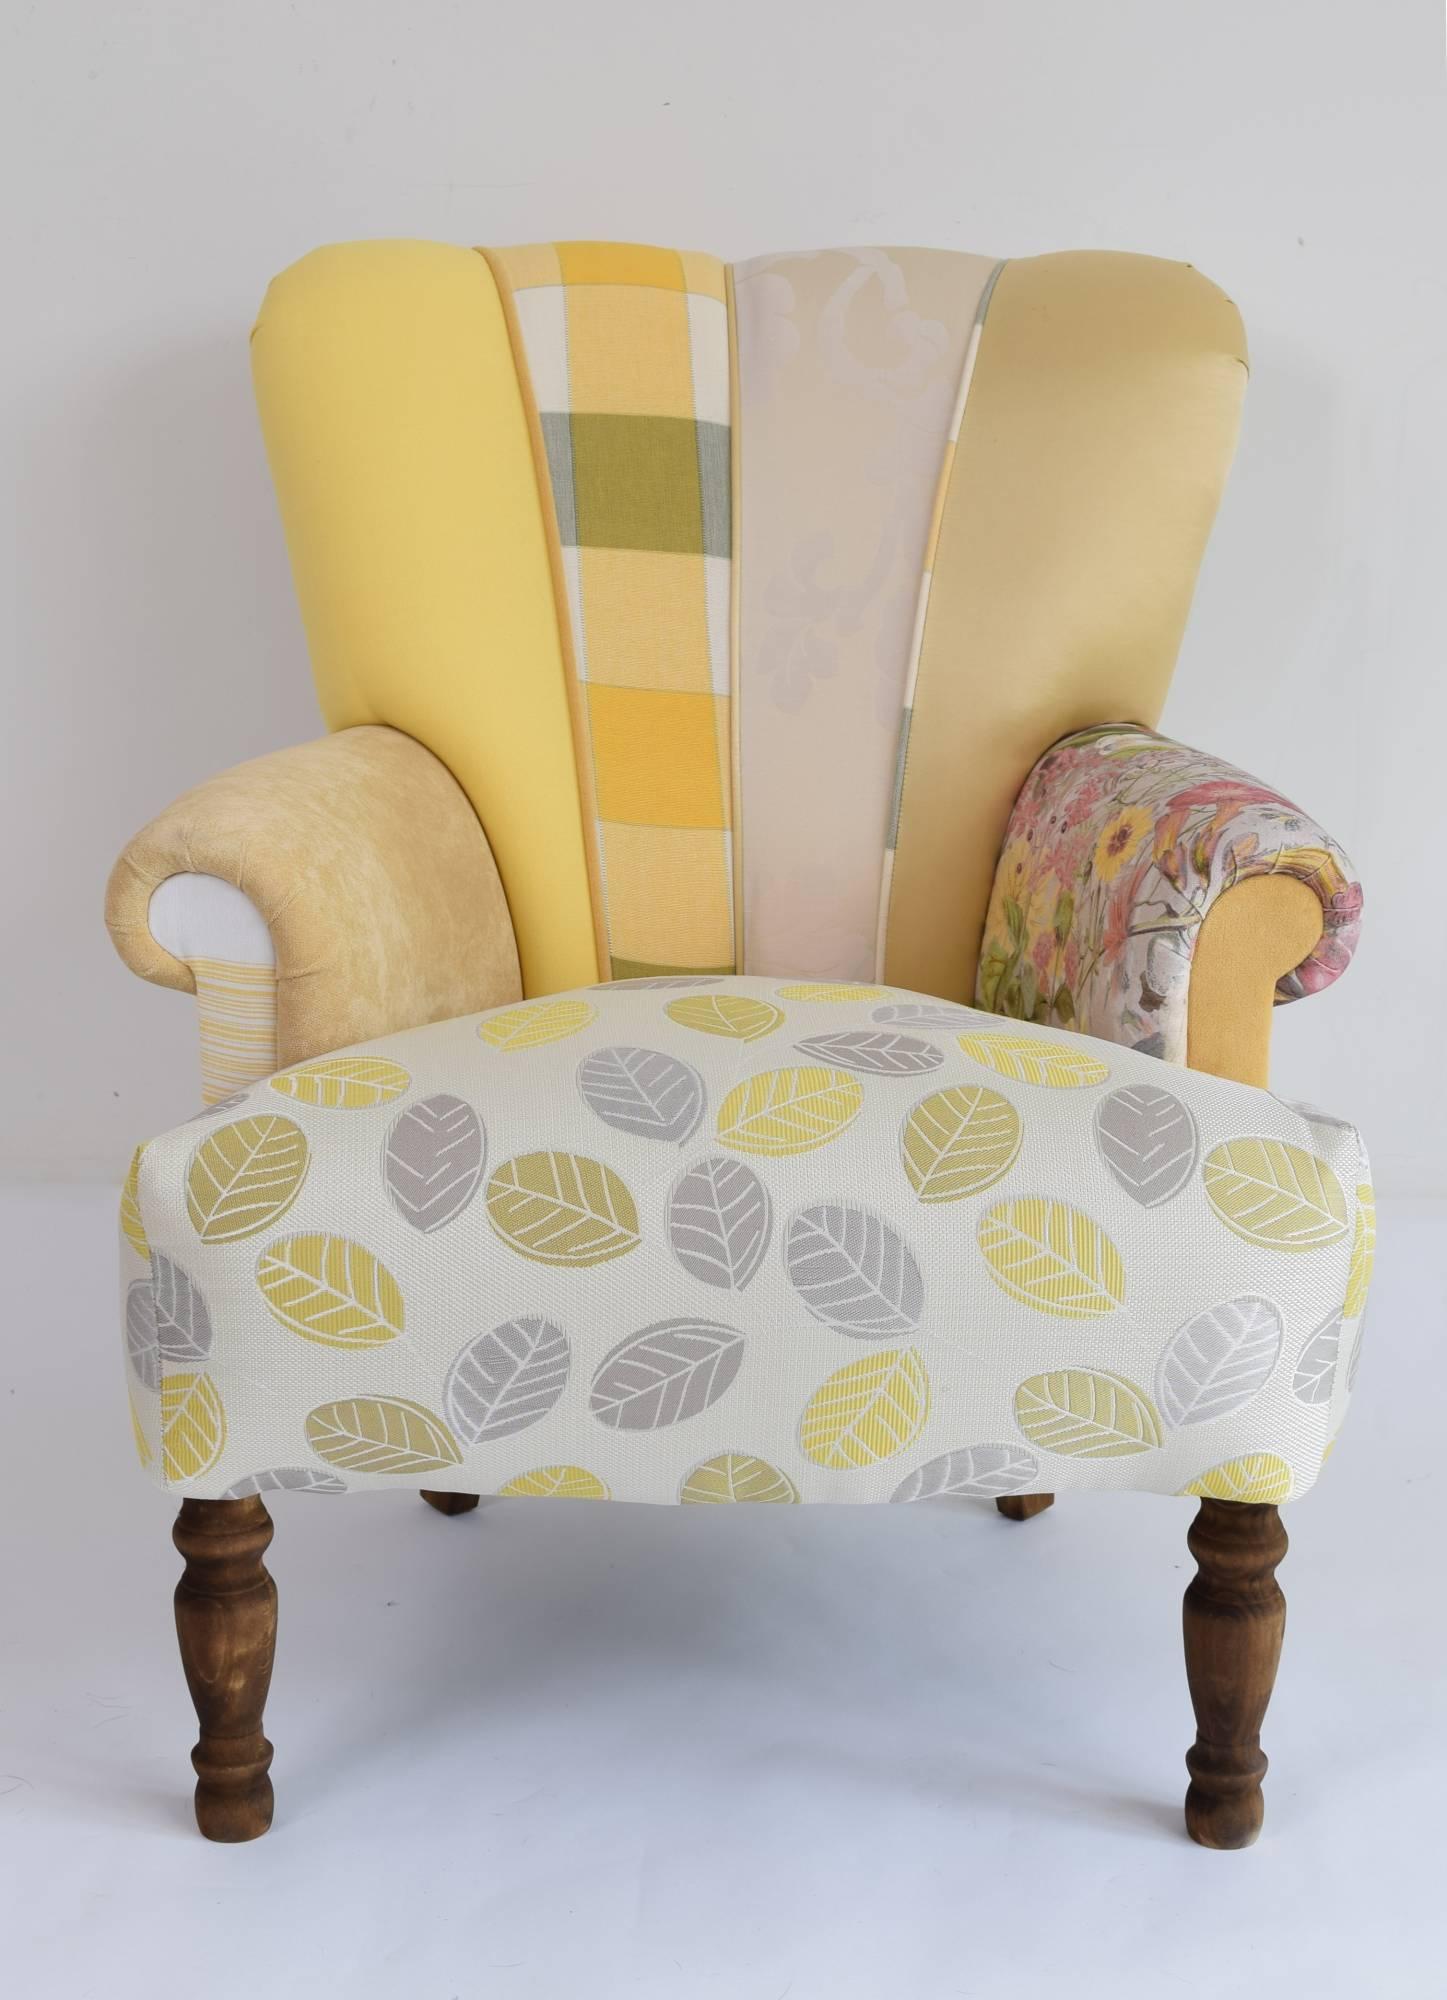 peter betteridge quirky harlequin chair 132